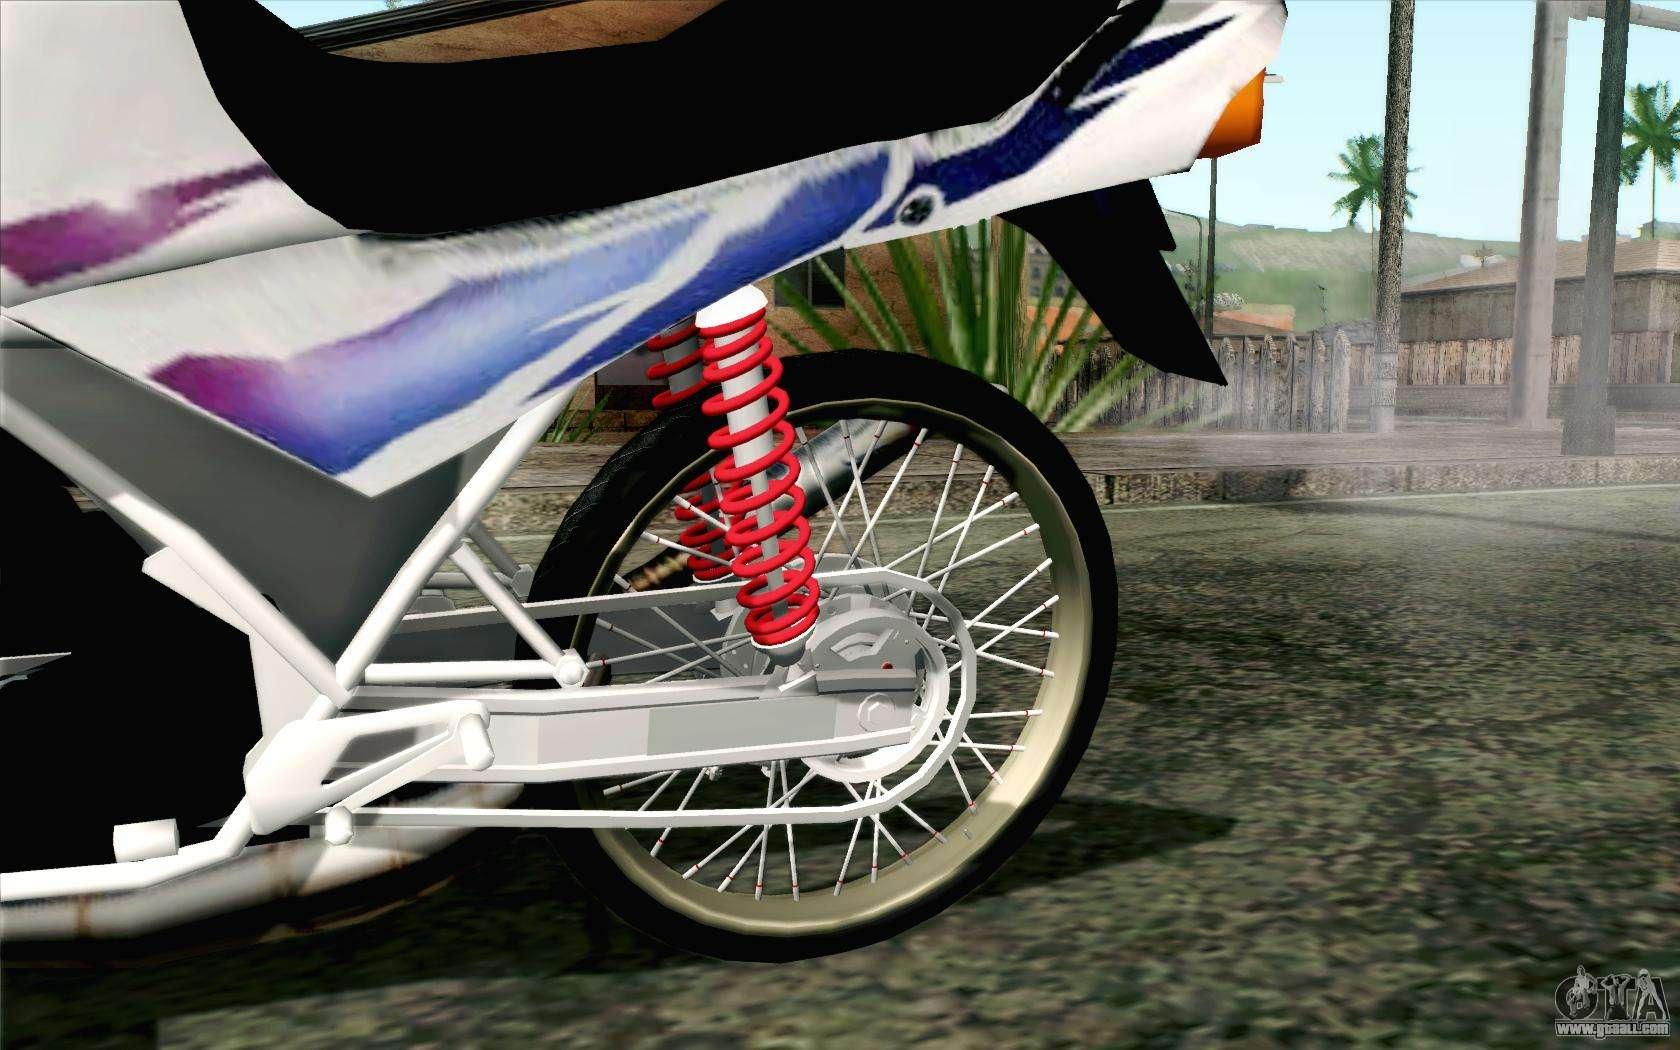 Yamaha rzr 135 drag for gta san andreas for Yamaha drag bike